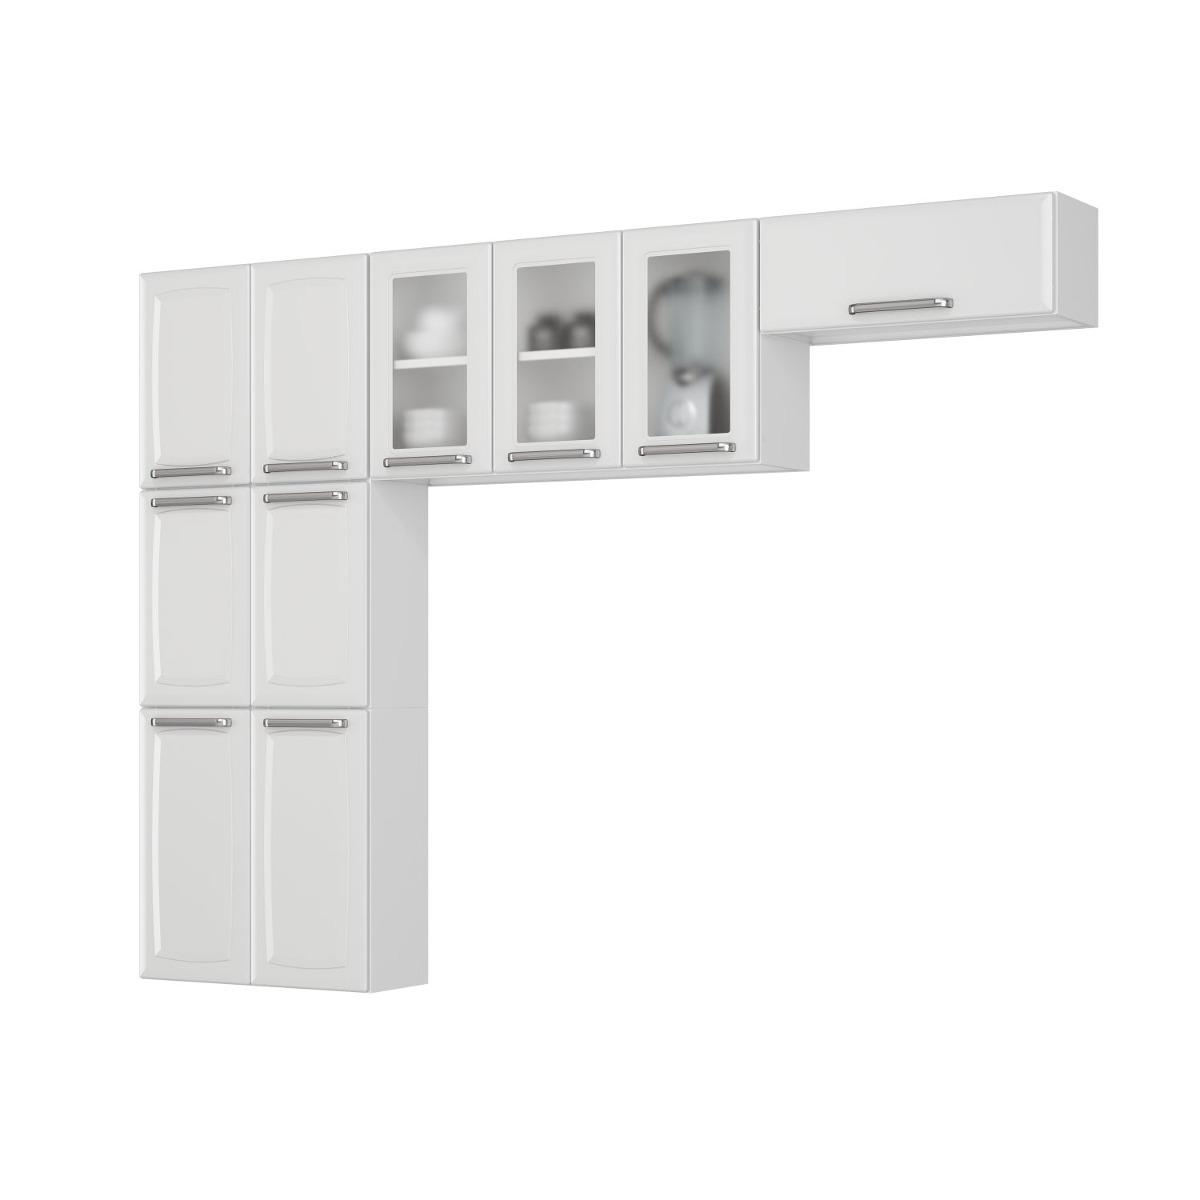 Cozinha Compacta 3 Pe As Luce Itatiaia Branco Jcwt R 671 90 Em